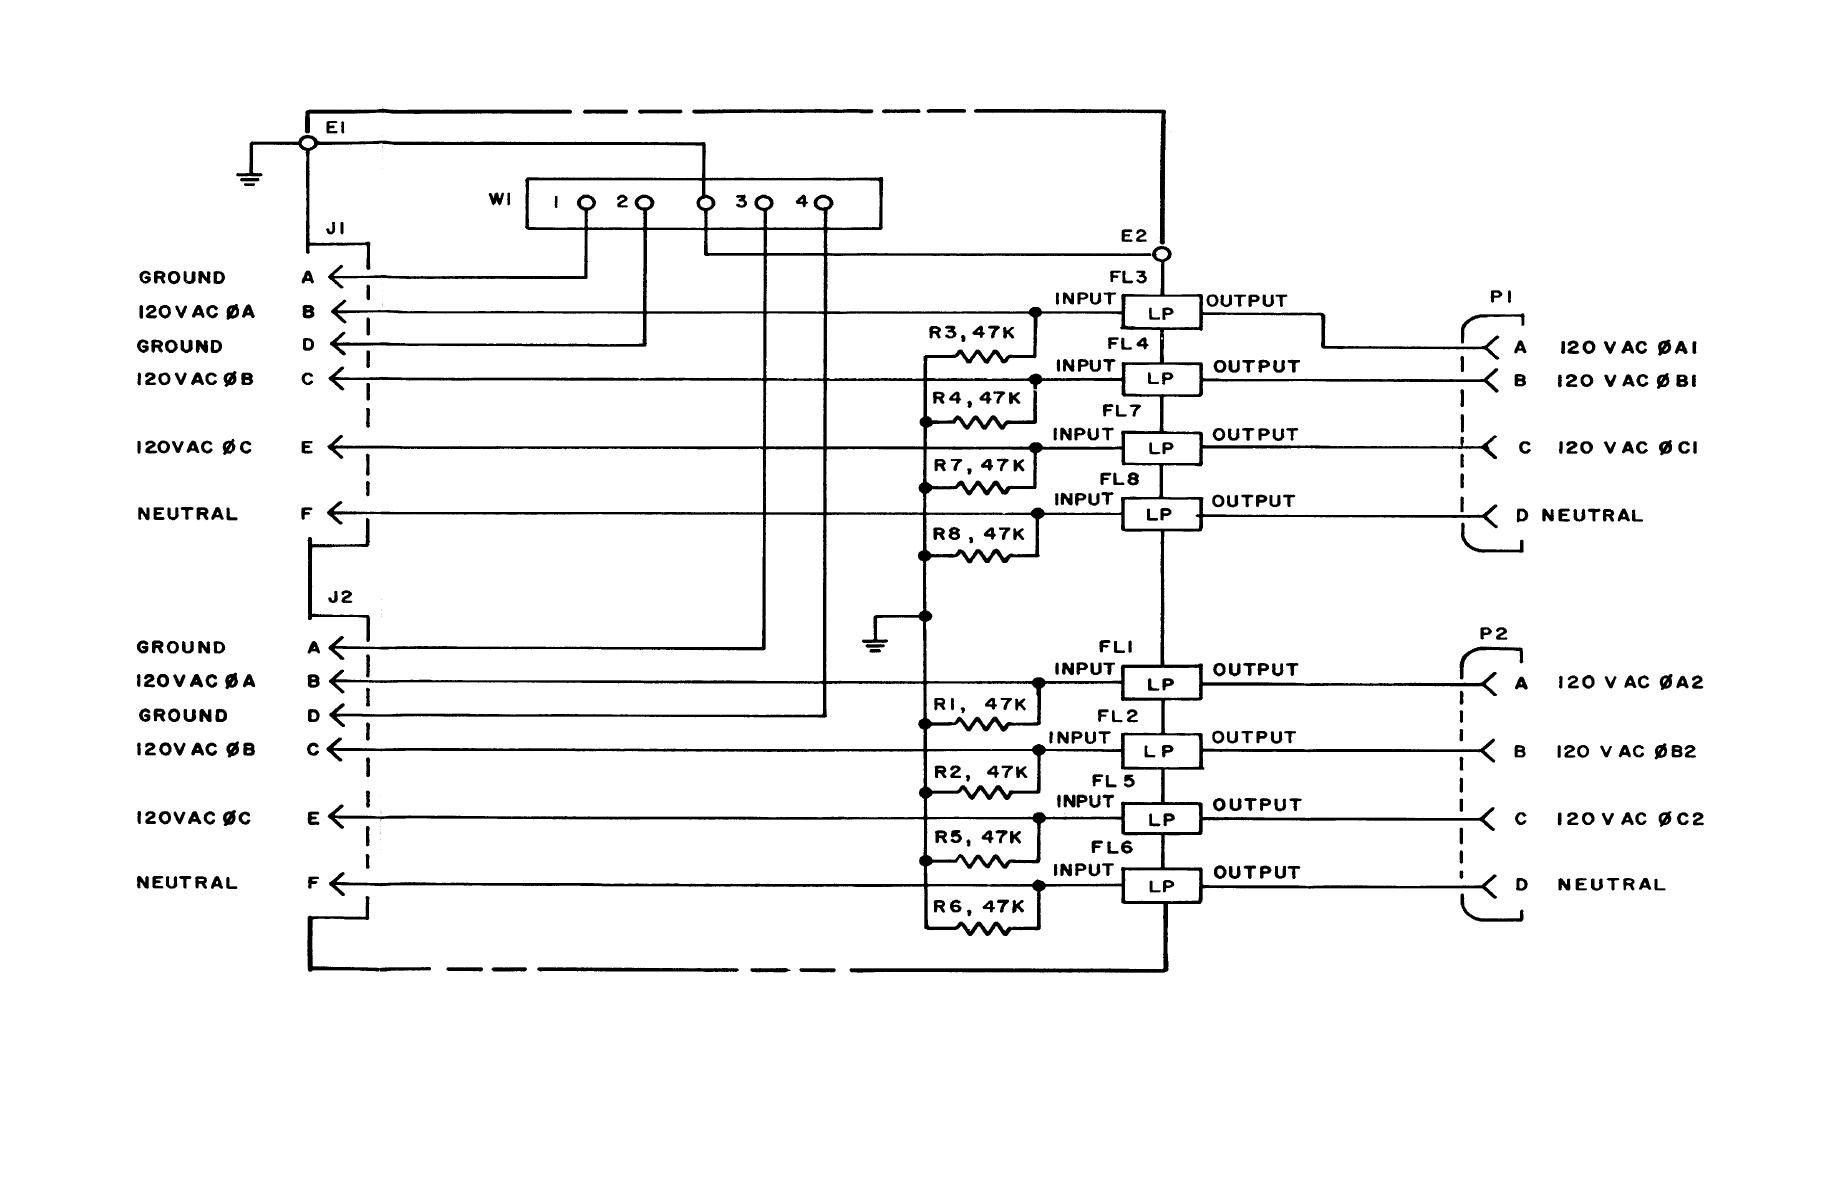 Unique Reading Schematic Diagrams  Diagram  Wiringdiagram  Diagramming  Diagramm  Visuals